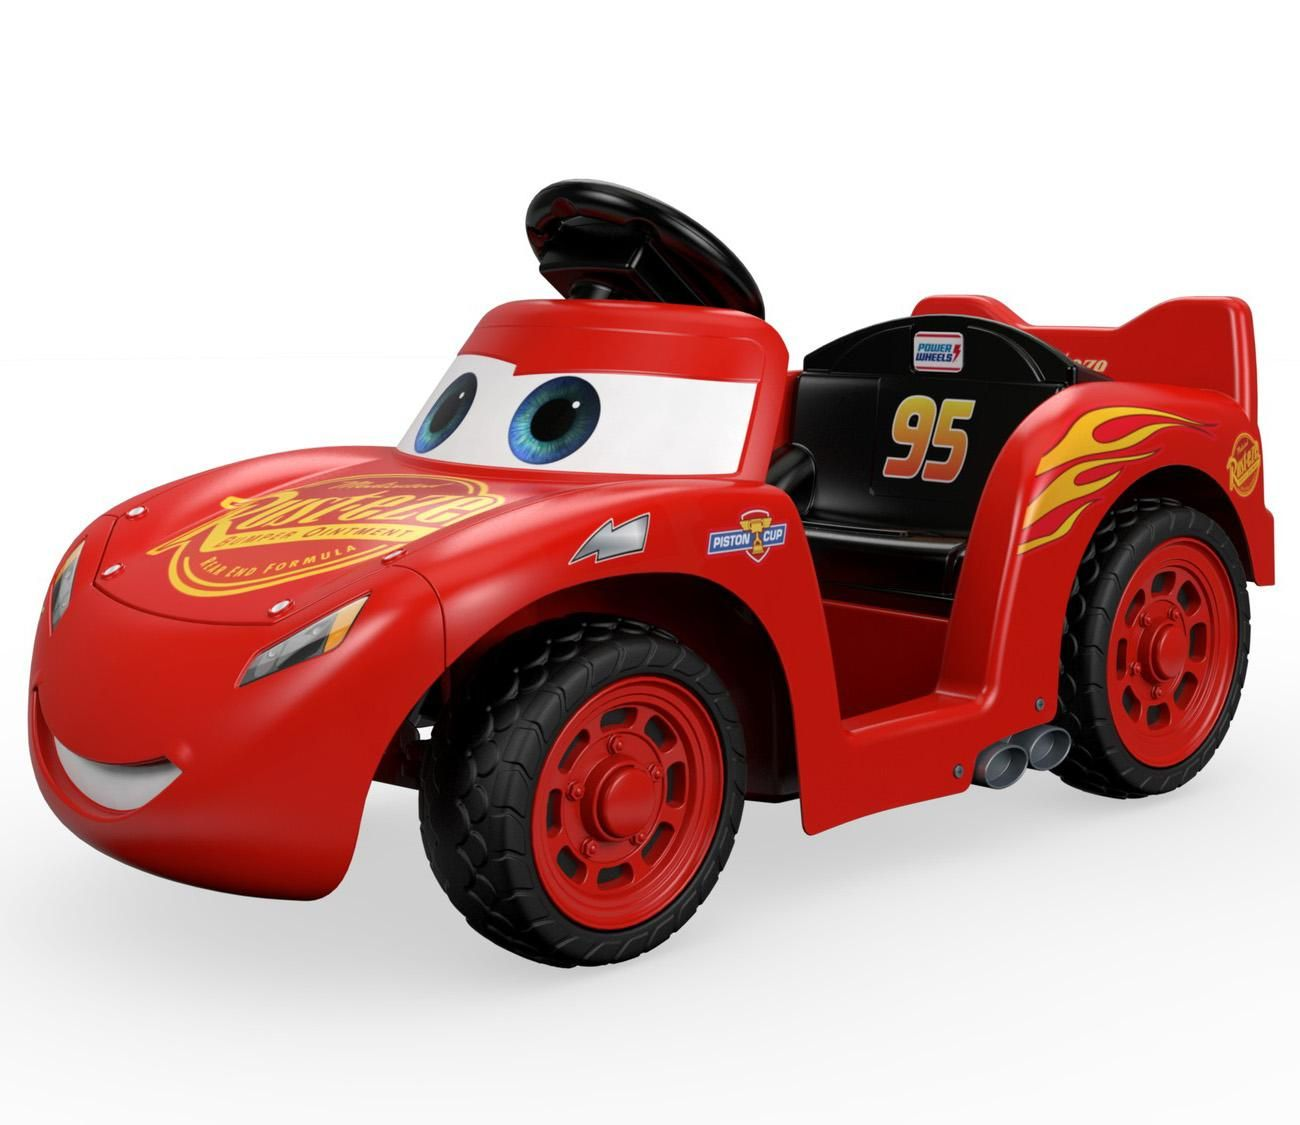 amazon com power wheels lil lightning mcqueen toys games cars